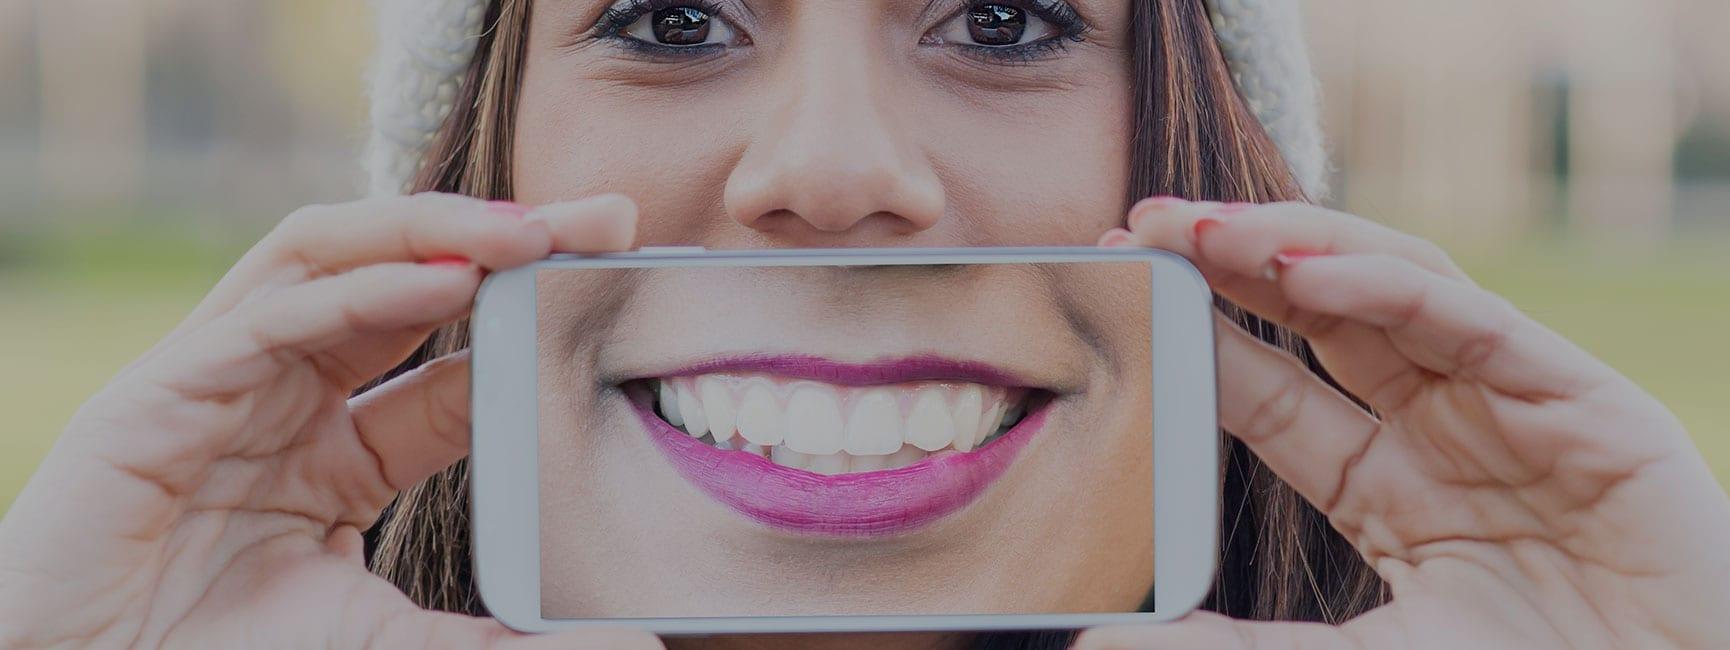 Healthy teeth, healthy you